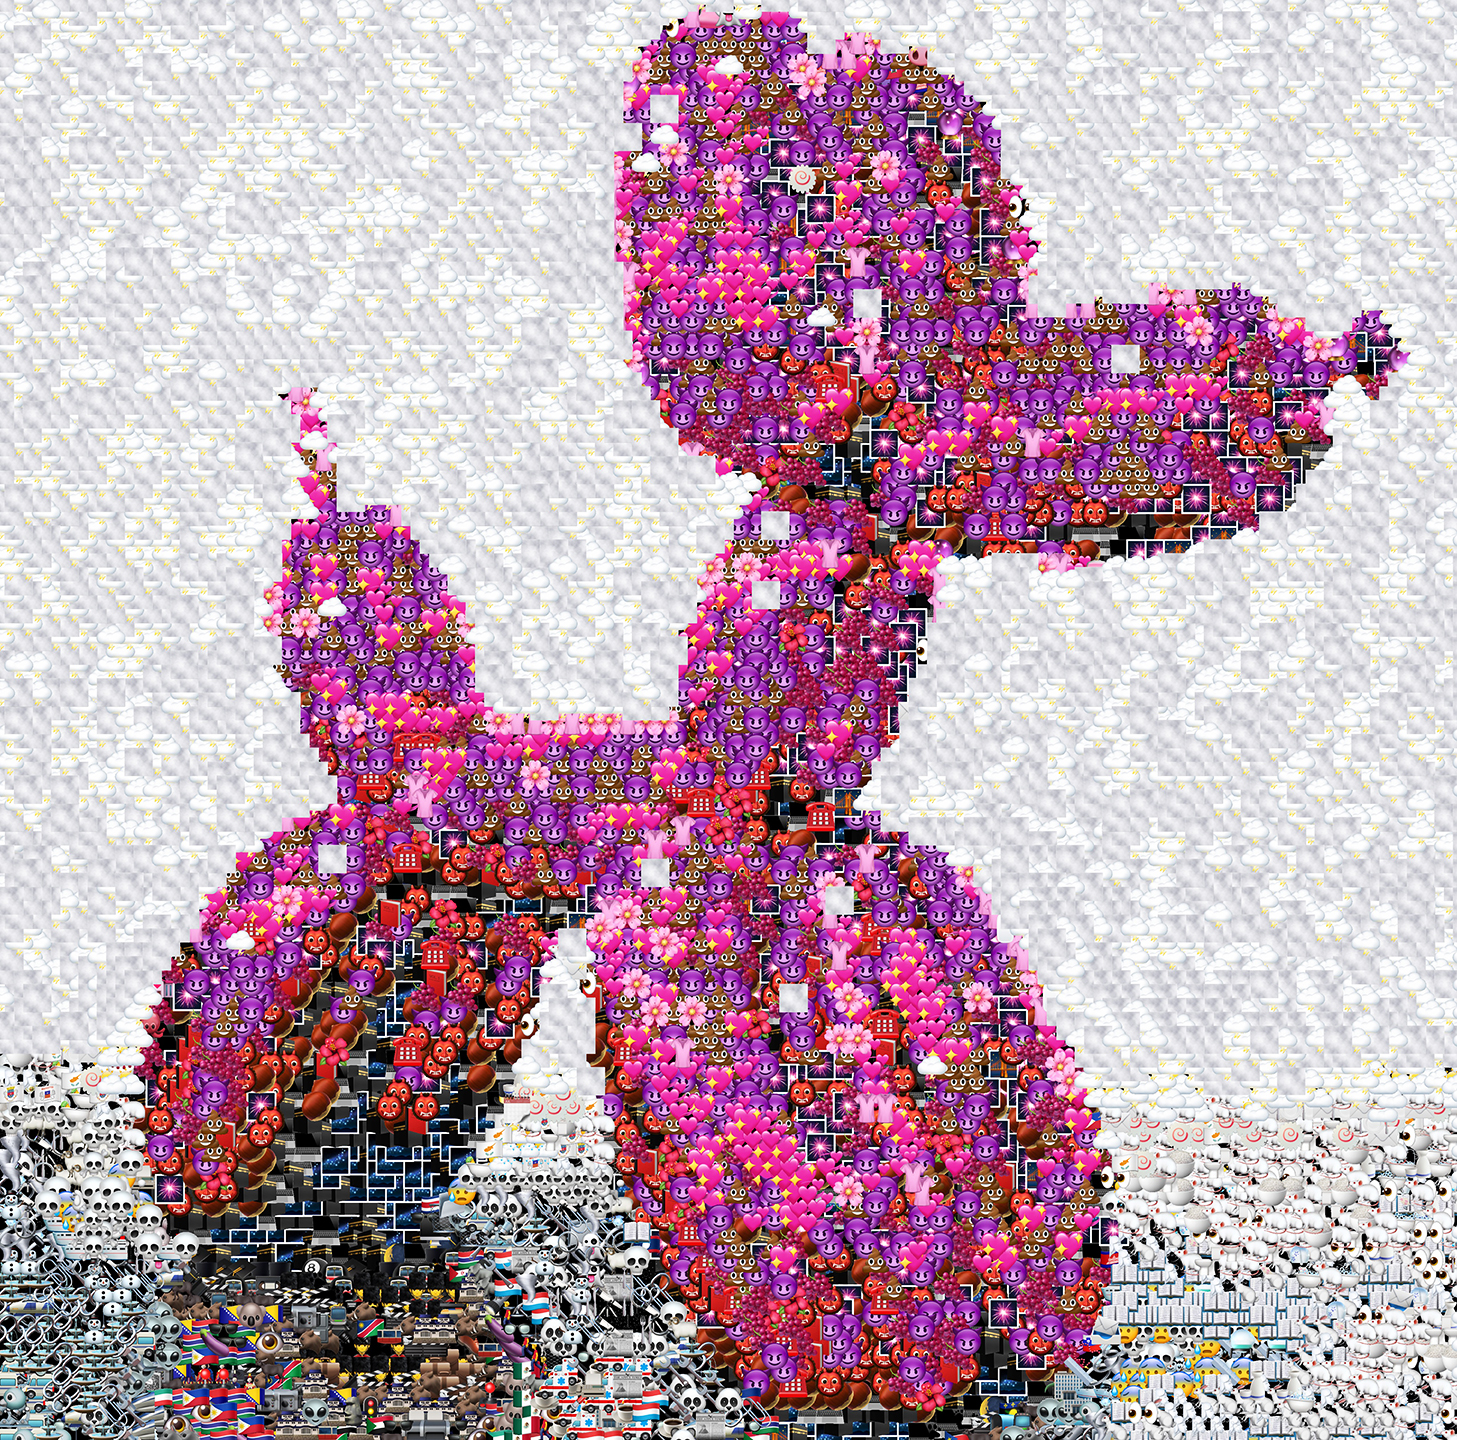 19_forweb_Jeff-Koons-'Balloon-Dog'_emoji-art-Natalya-Nova.jpg